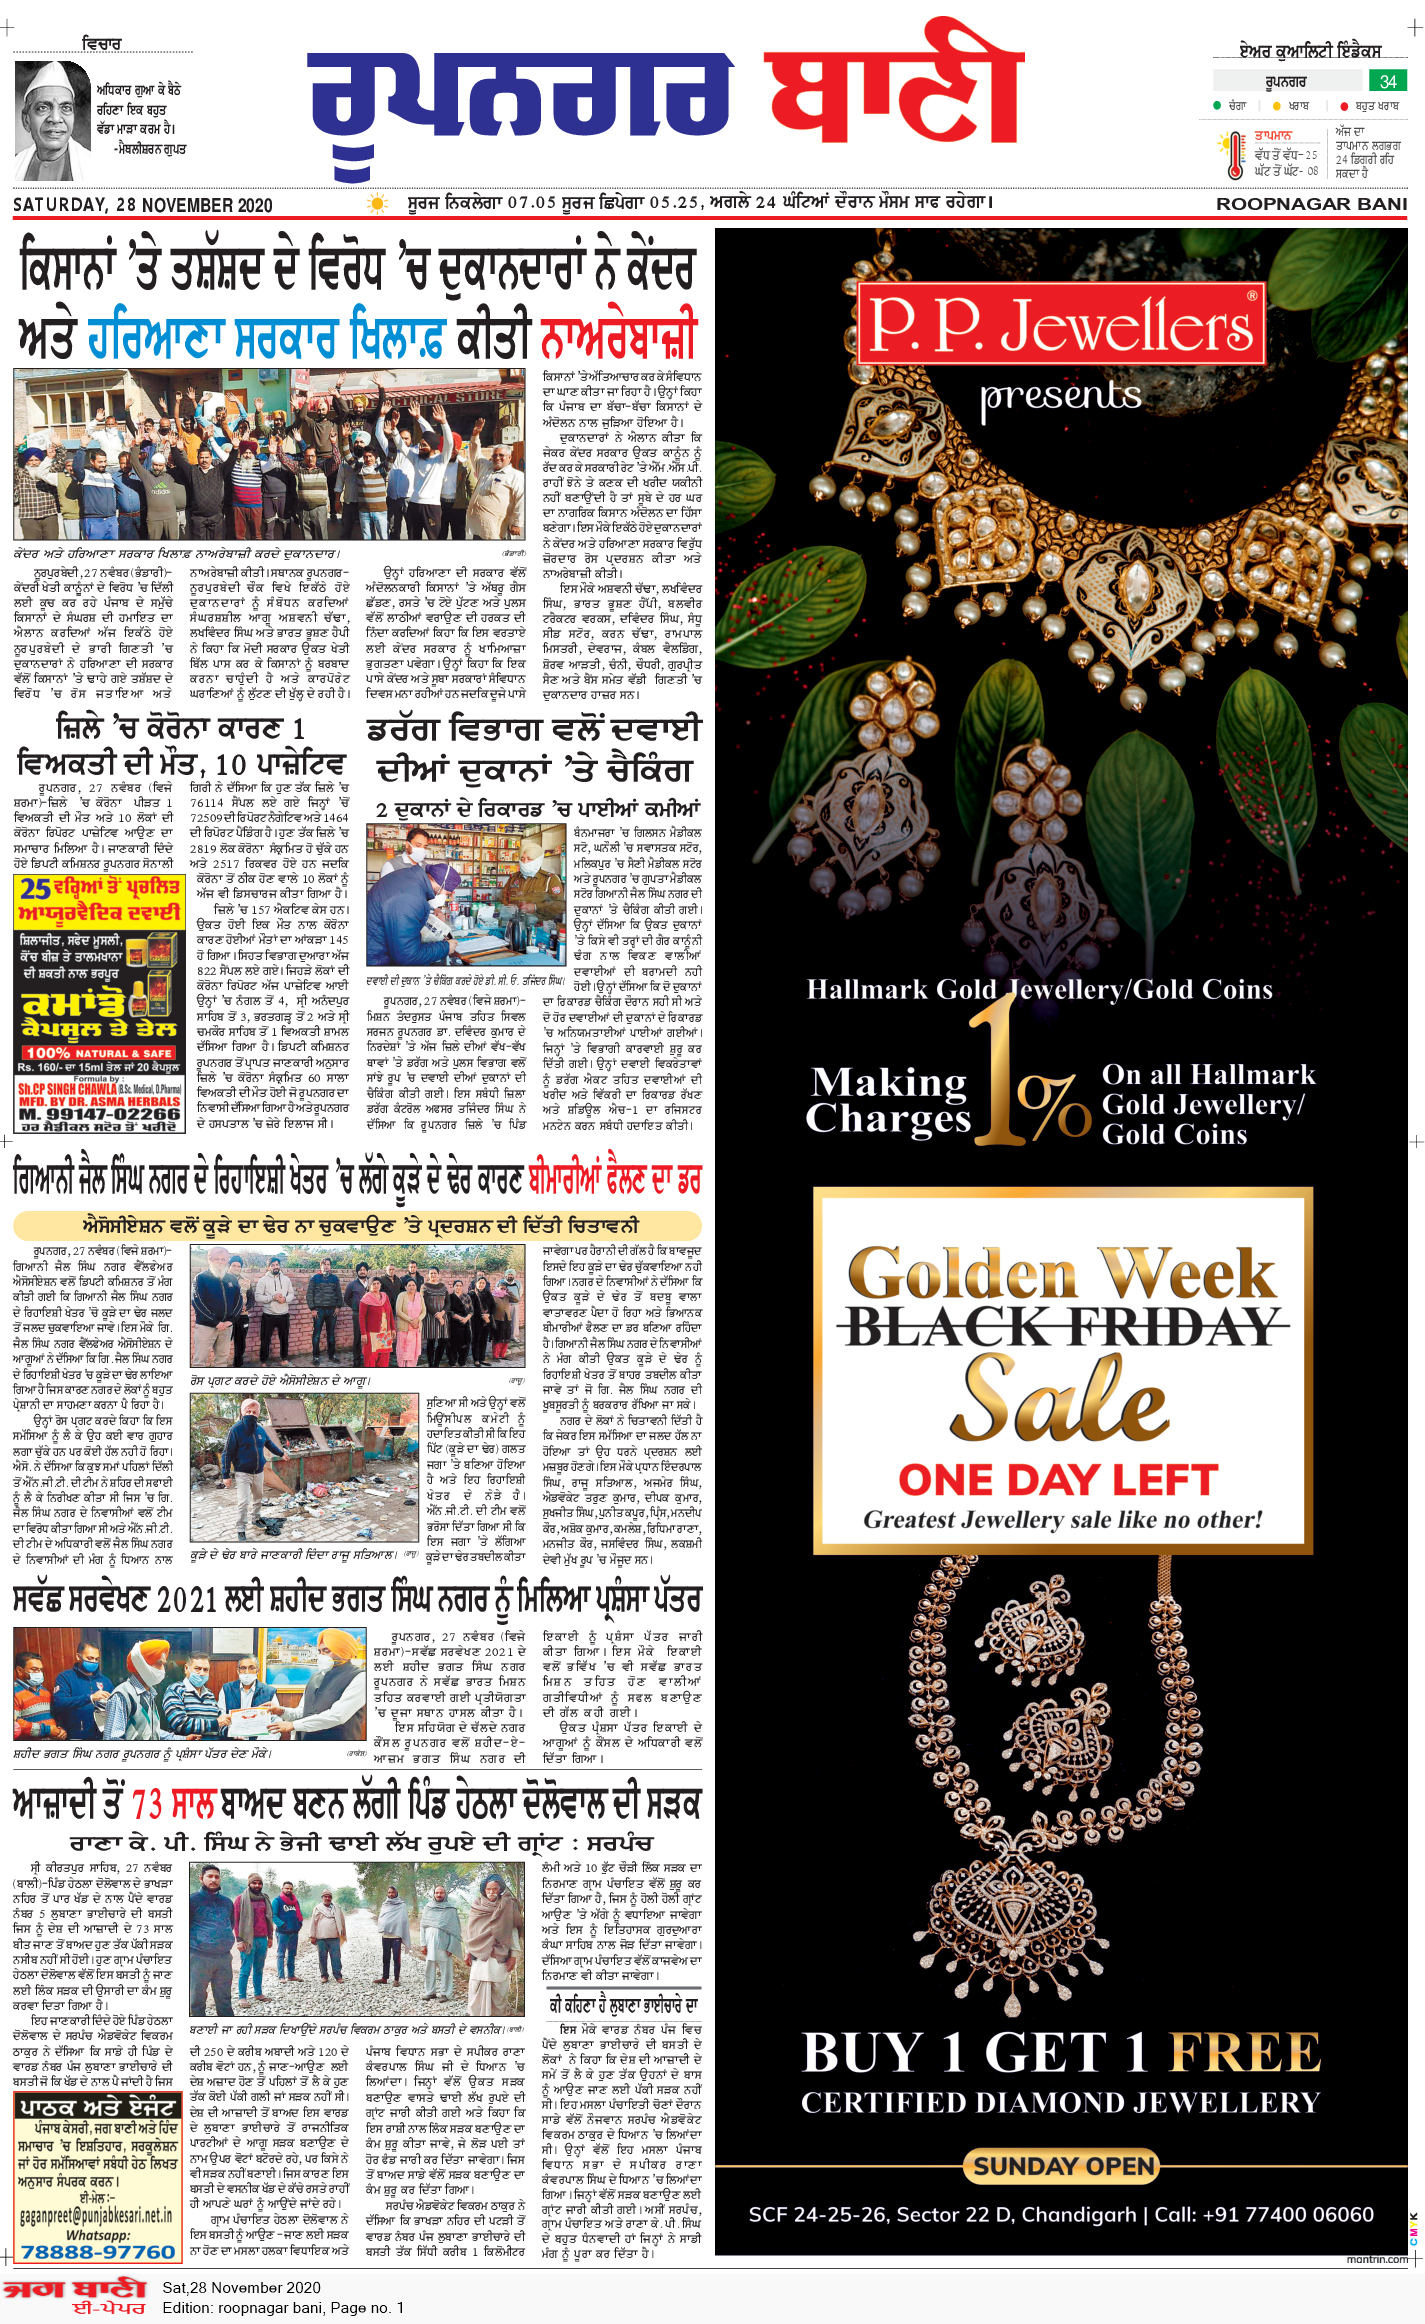 Roopnagar Bani 11/28/2020 12:00:00 AM